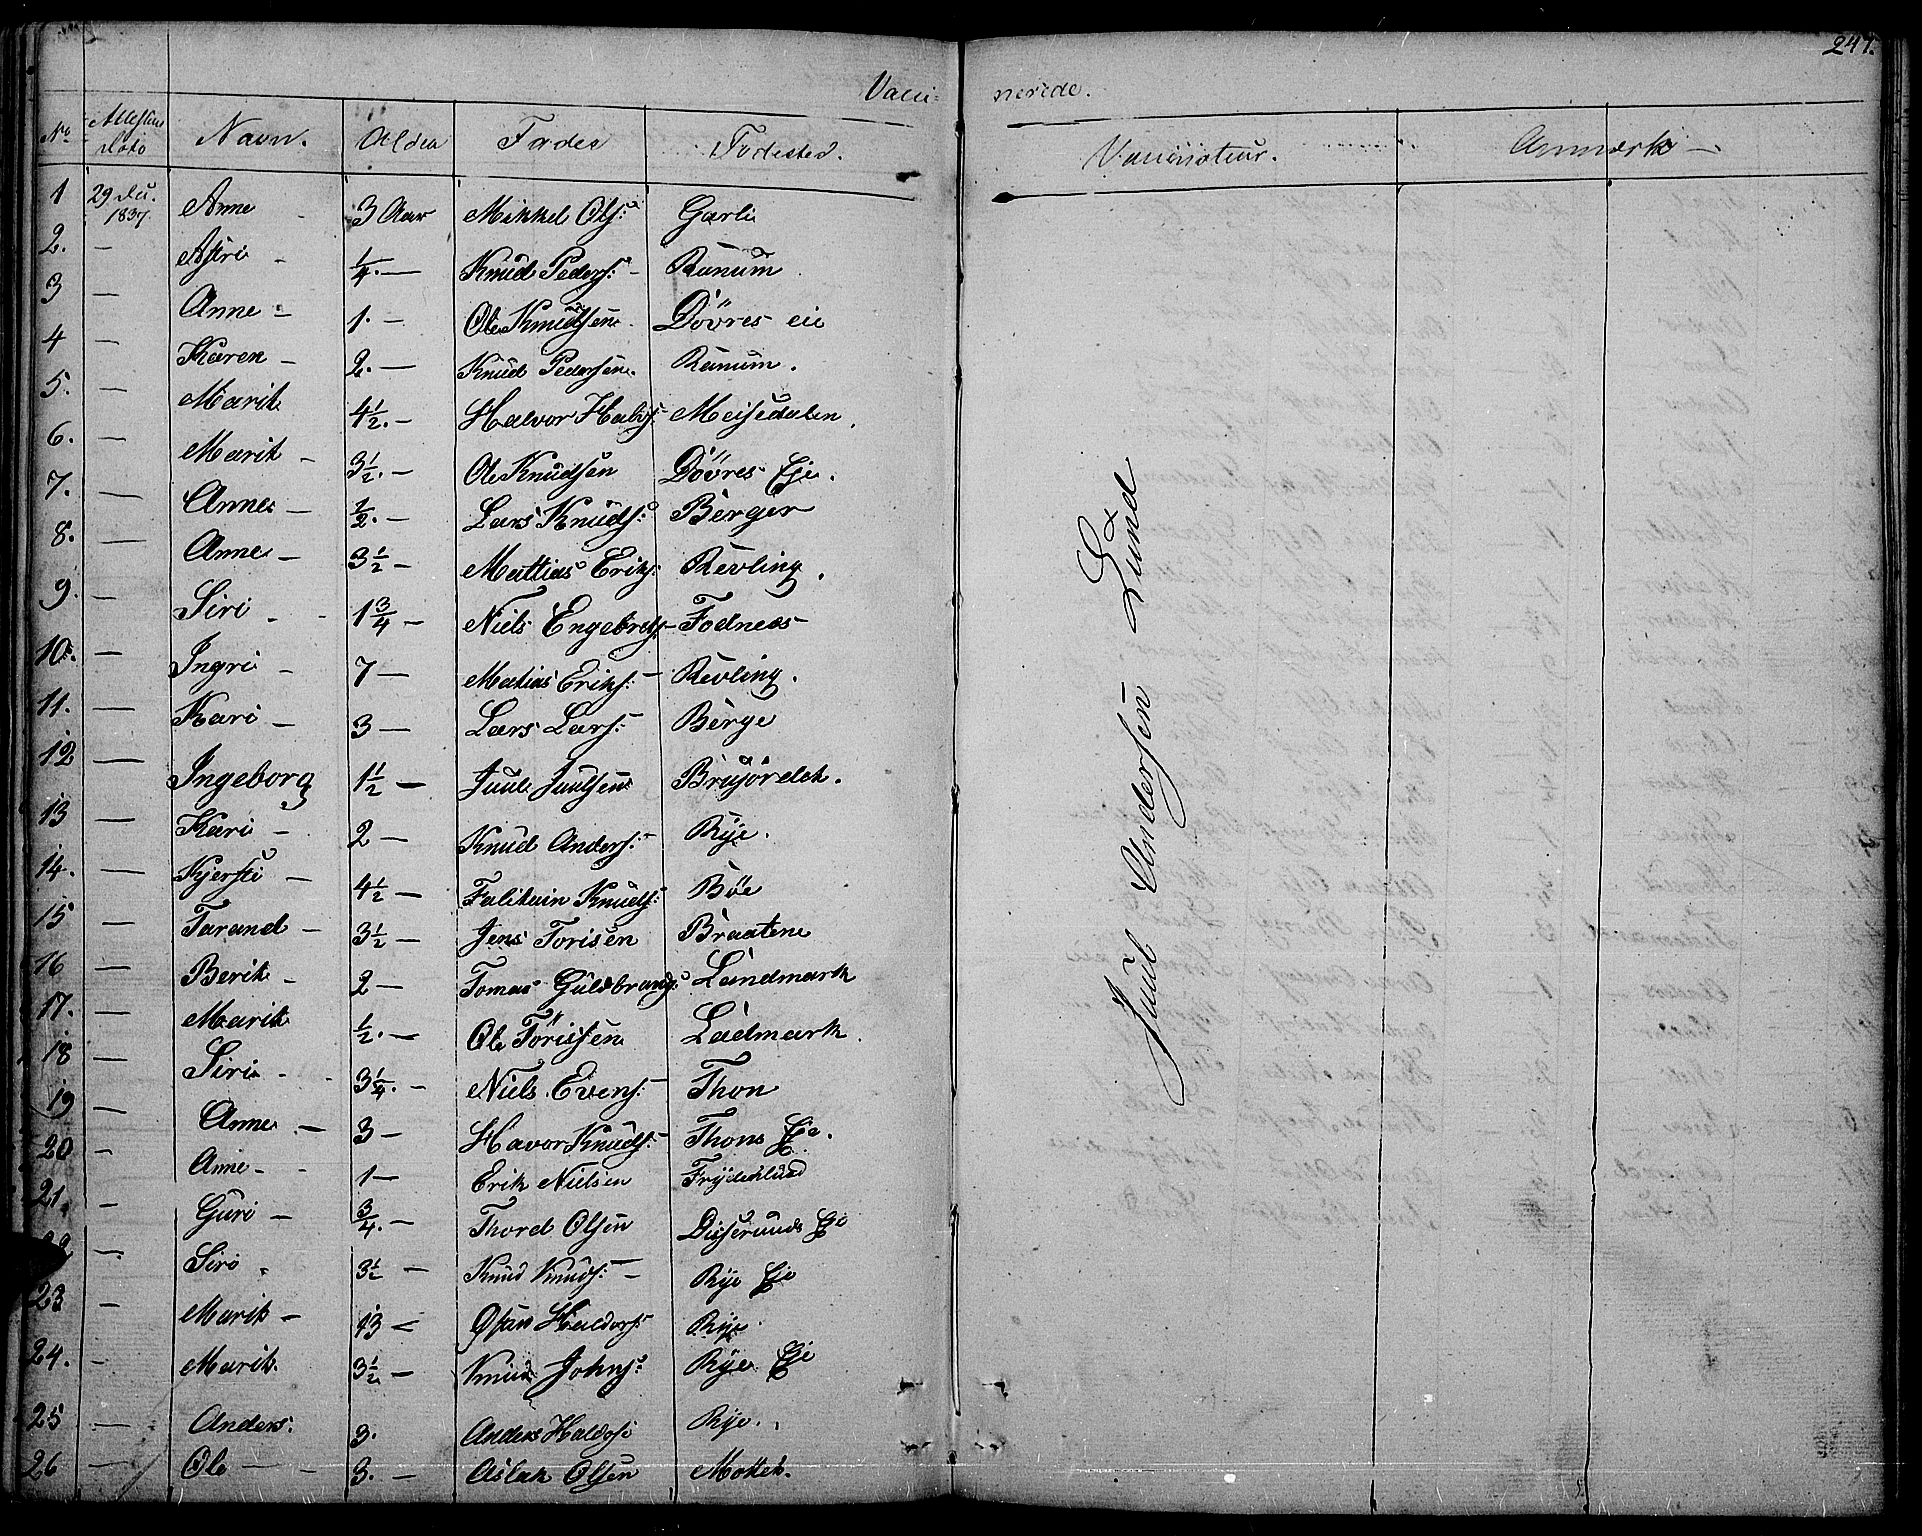 SAH, Nord-Aurdal prestekontor, Ministerialbok nr. 3, 1828-1841, s. 247